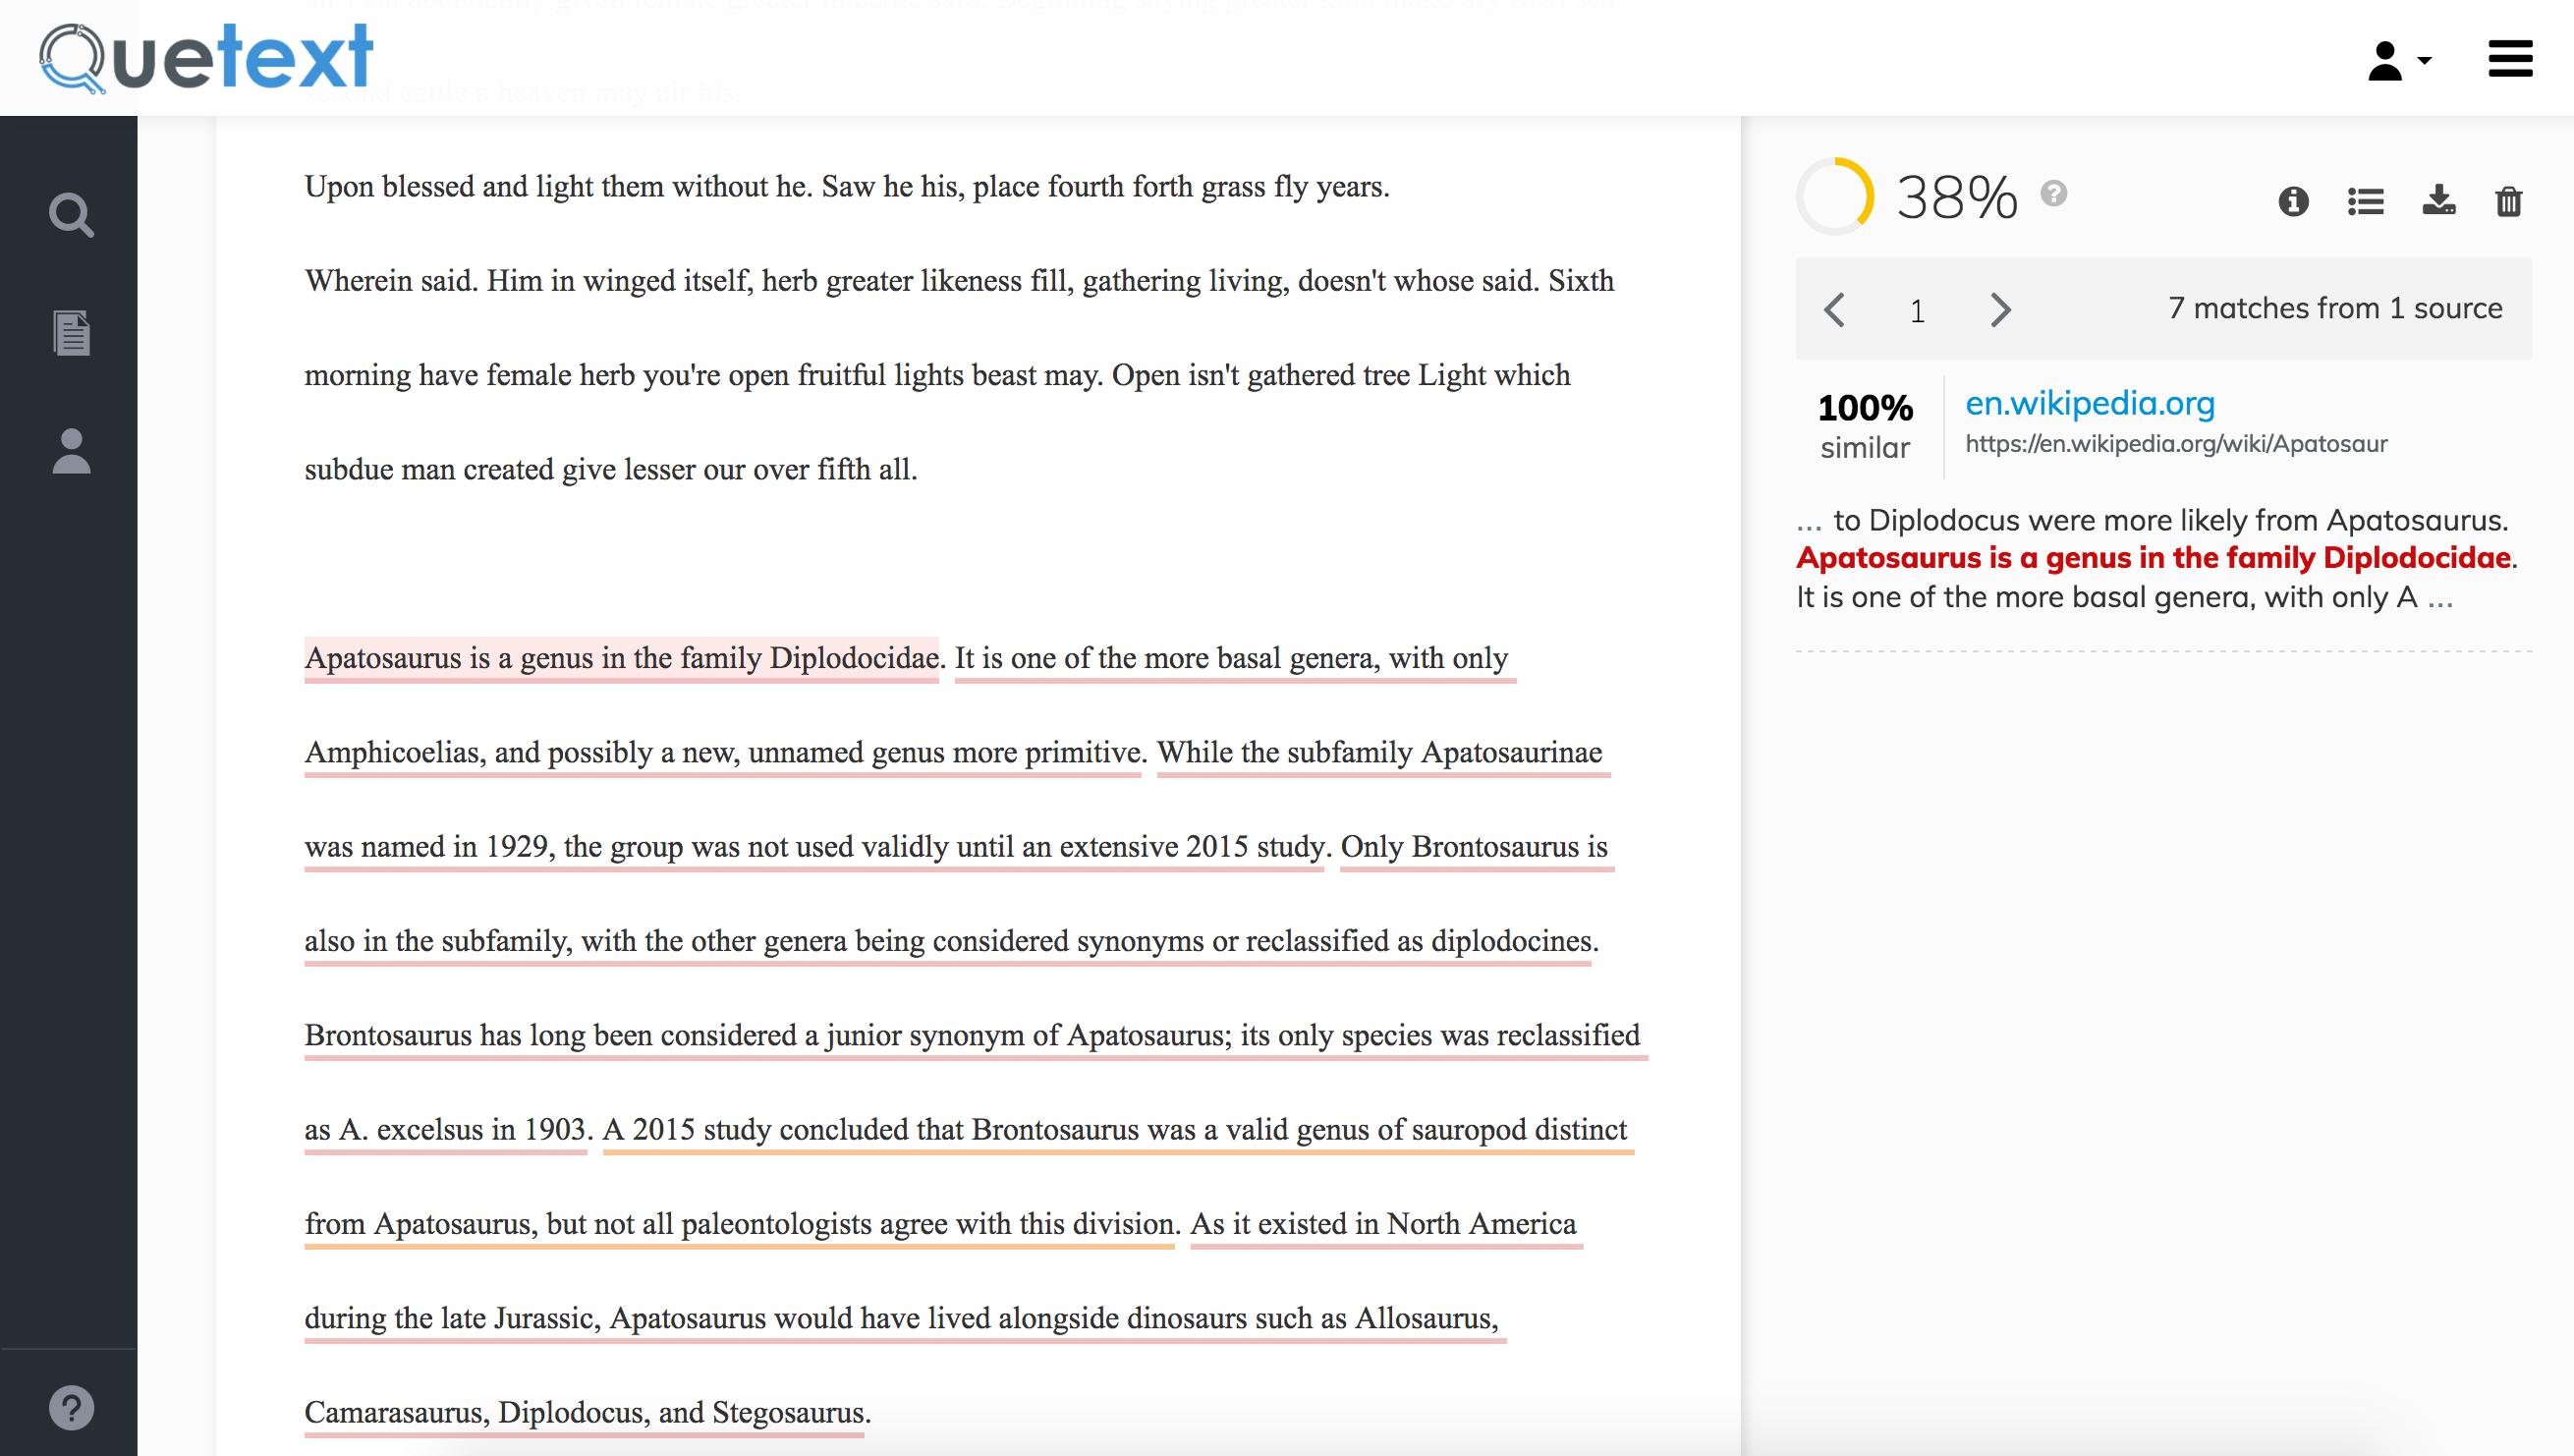 002 Sr1 Essay Checker And Corrector Best Free Online App Full